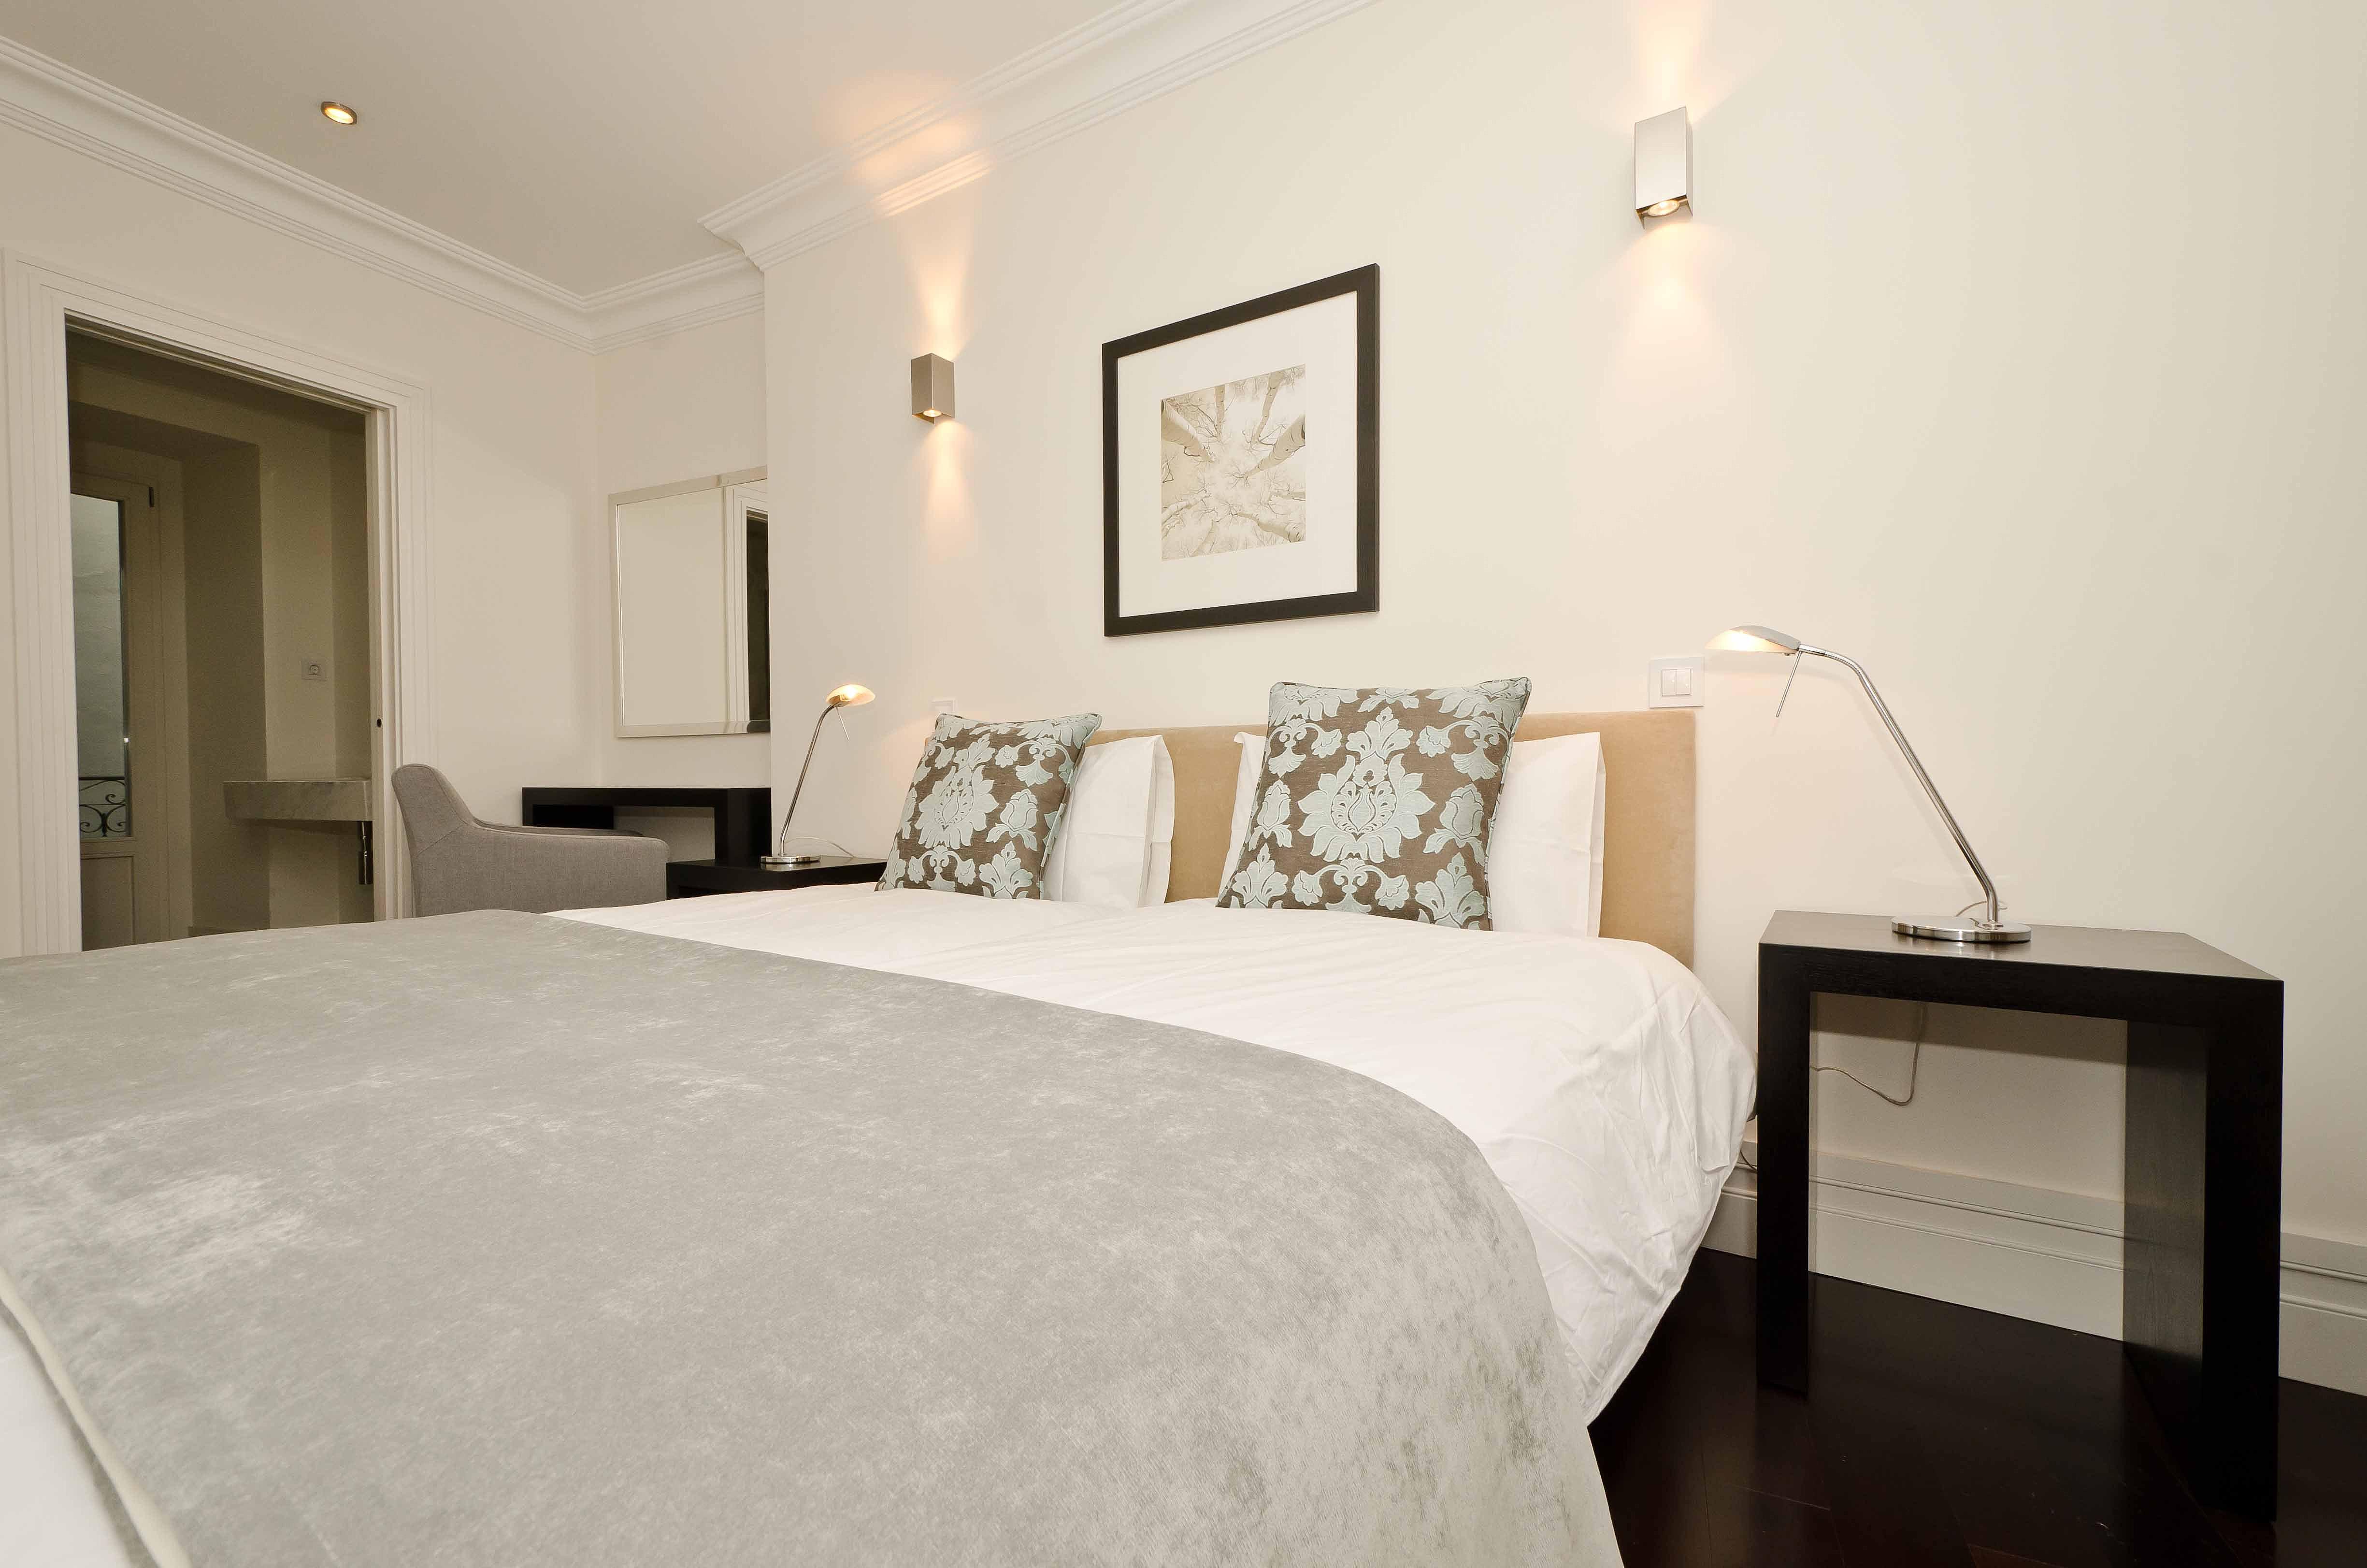 Furniture package apartment lisbon for Bedroom furniture union nj